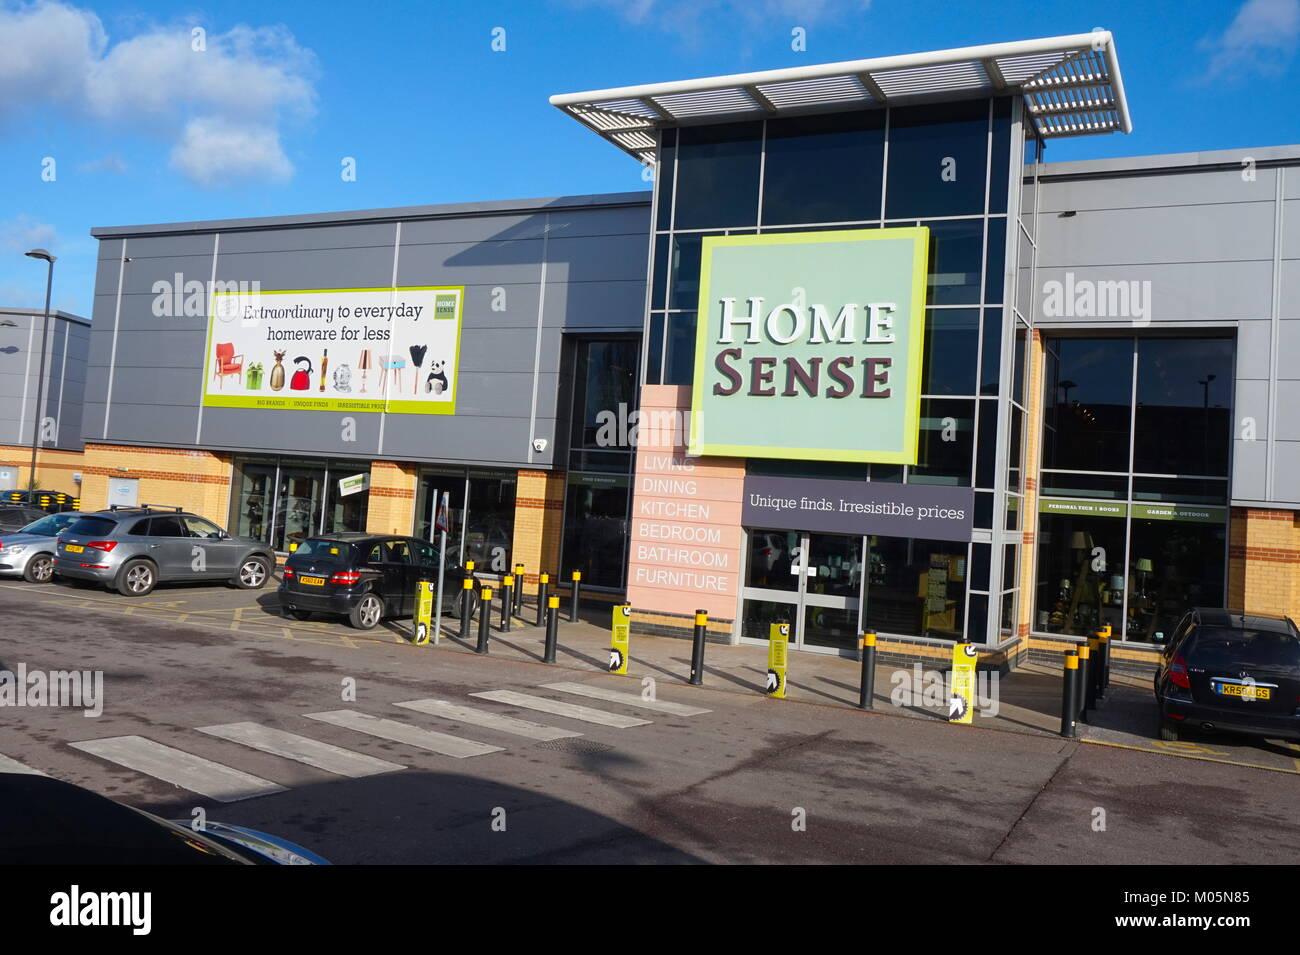 Home senso, Staples Corner Retail Park Immagini Stock